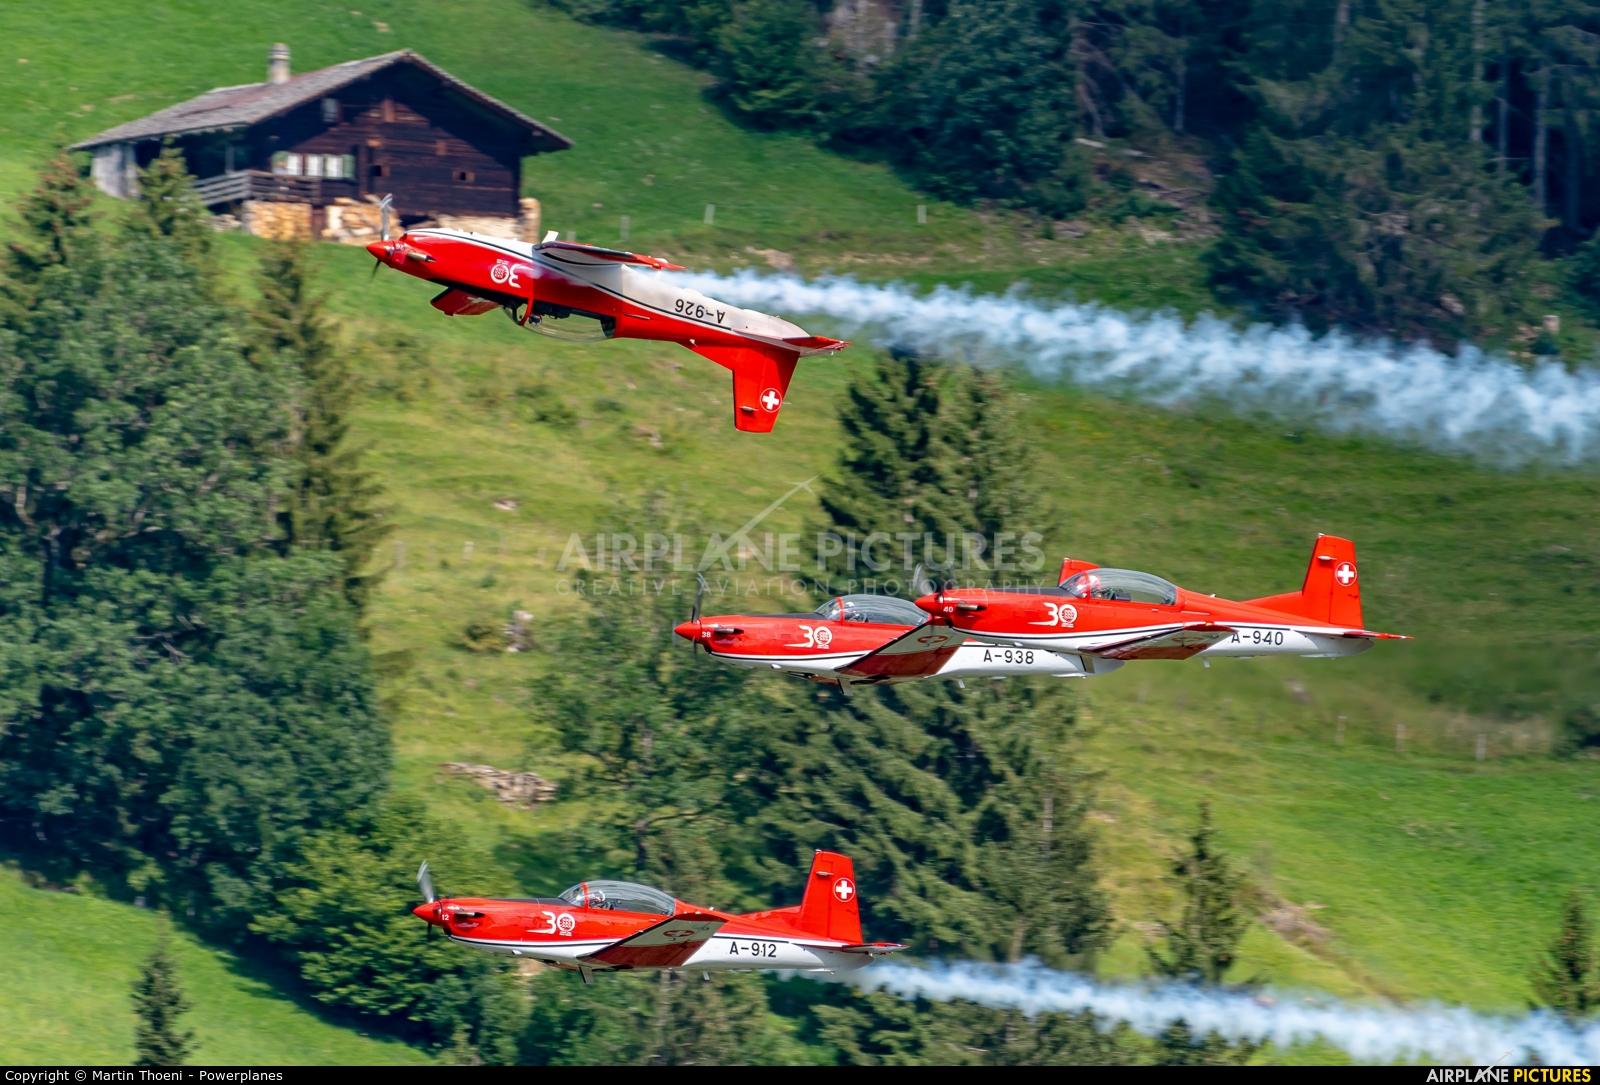 Switzerland - Air Force: PC-7 Team A-940 aircraft at St. Stephan